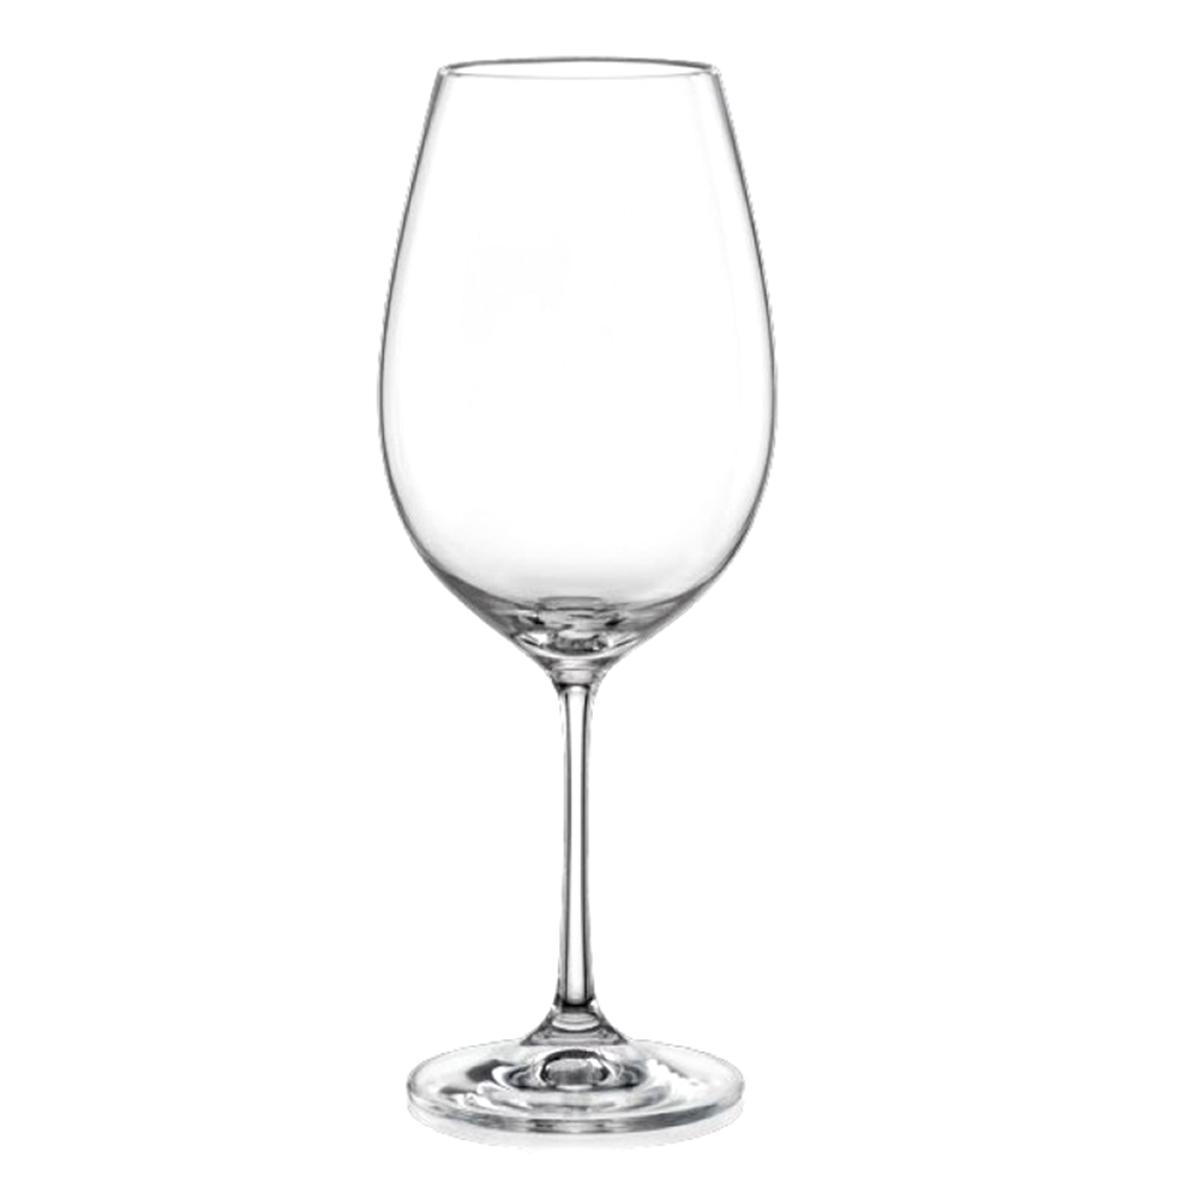 Набор бокалов для вина Bohemia Crystal Виола, 550 мл, 6 шт rostok visa набор для выращивания виола